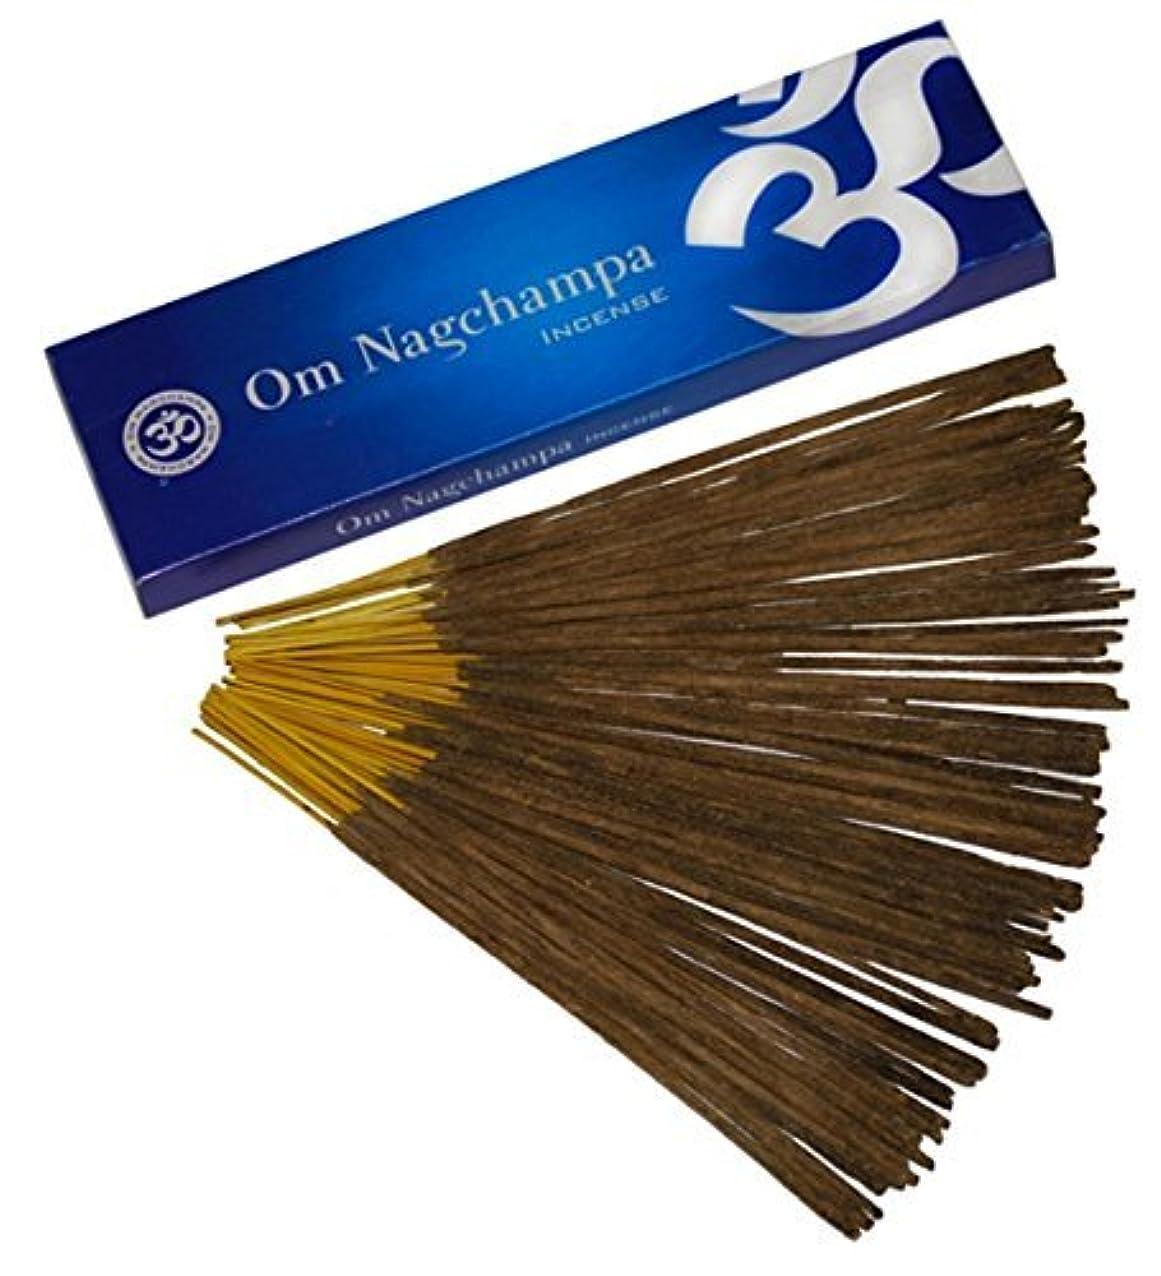 Om Nagchampa Nag ChampaプレミアムIncense Fragrance 15 g 40 g 100 g 100g ブラウン B00MV3LZ9E